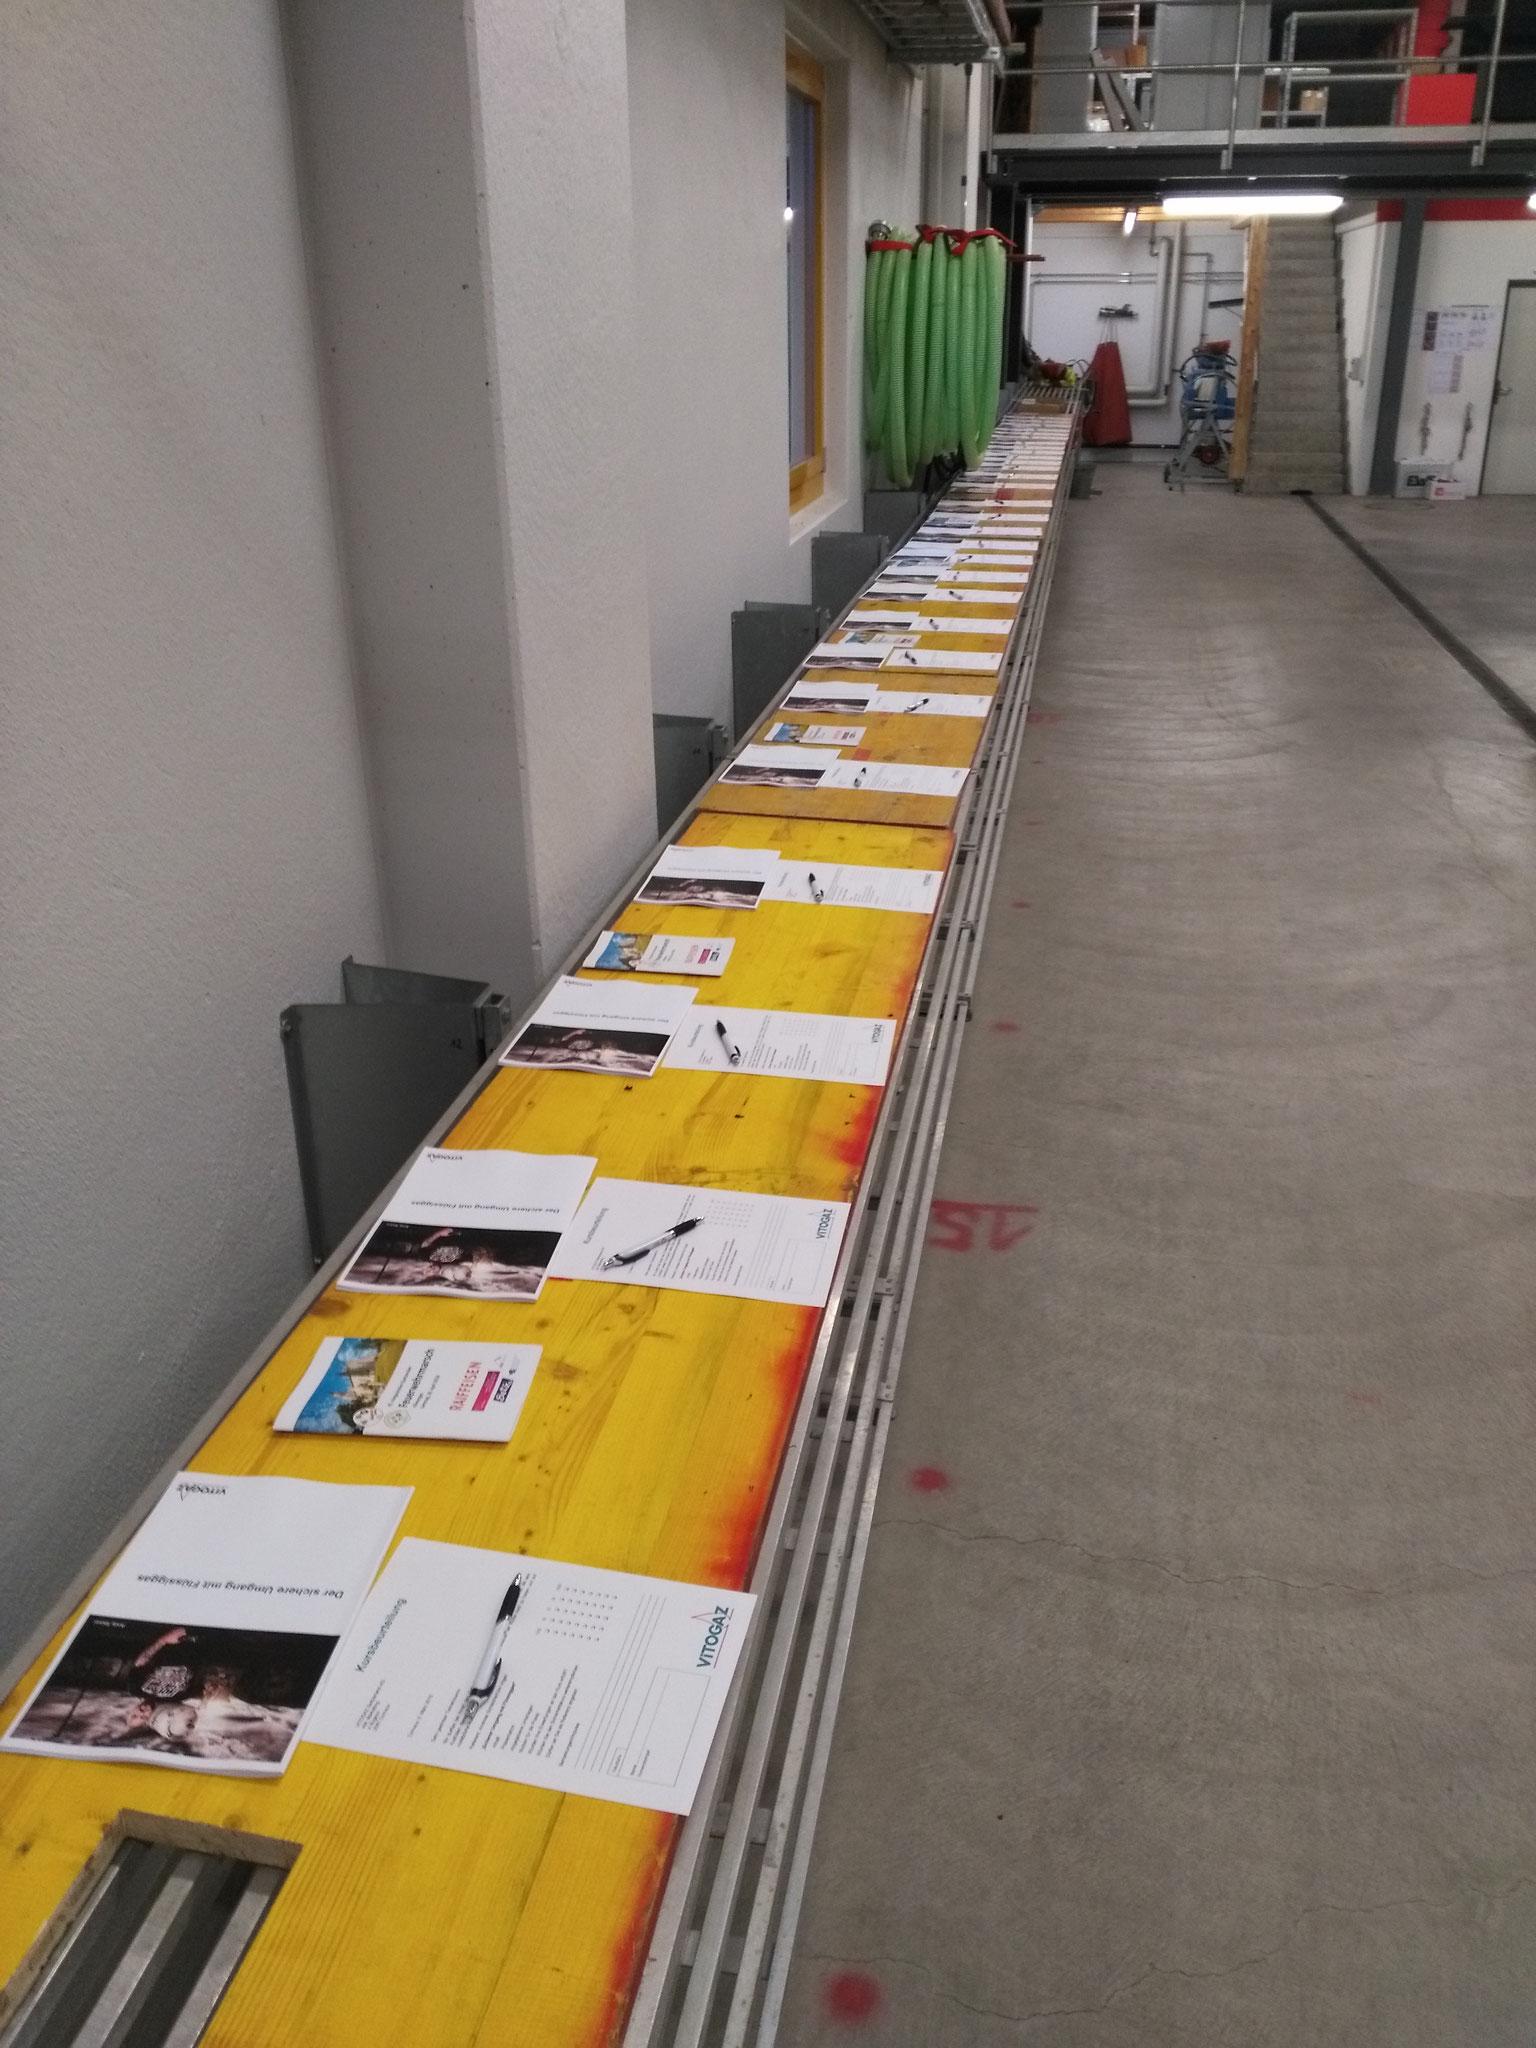 Kreisturnfest Dintikon 2018, zäme gwönne!, das Turnfest im Aargau! Vitogaz, FW Rietenberg